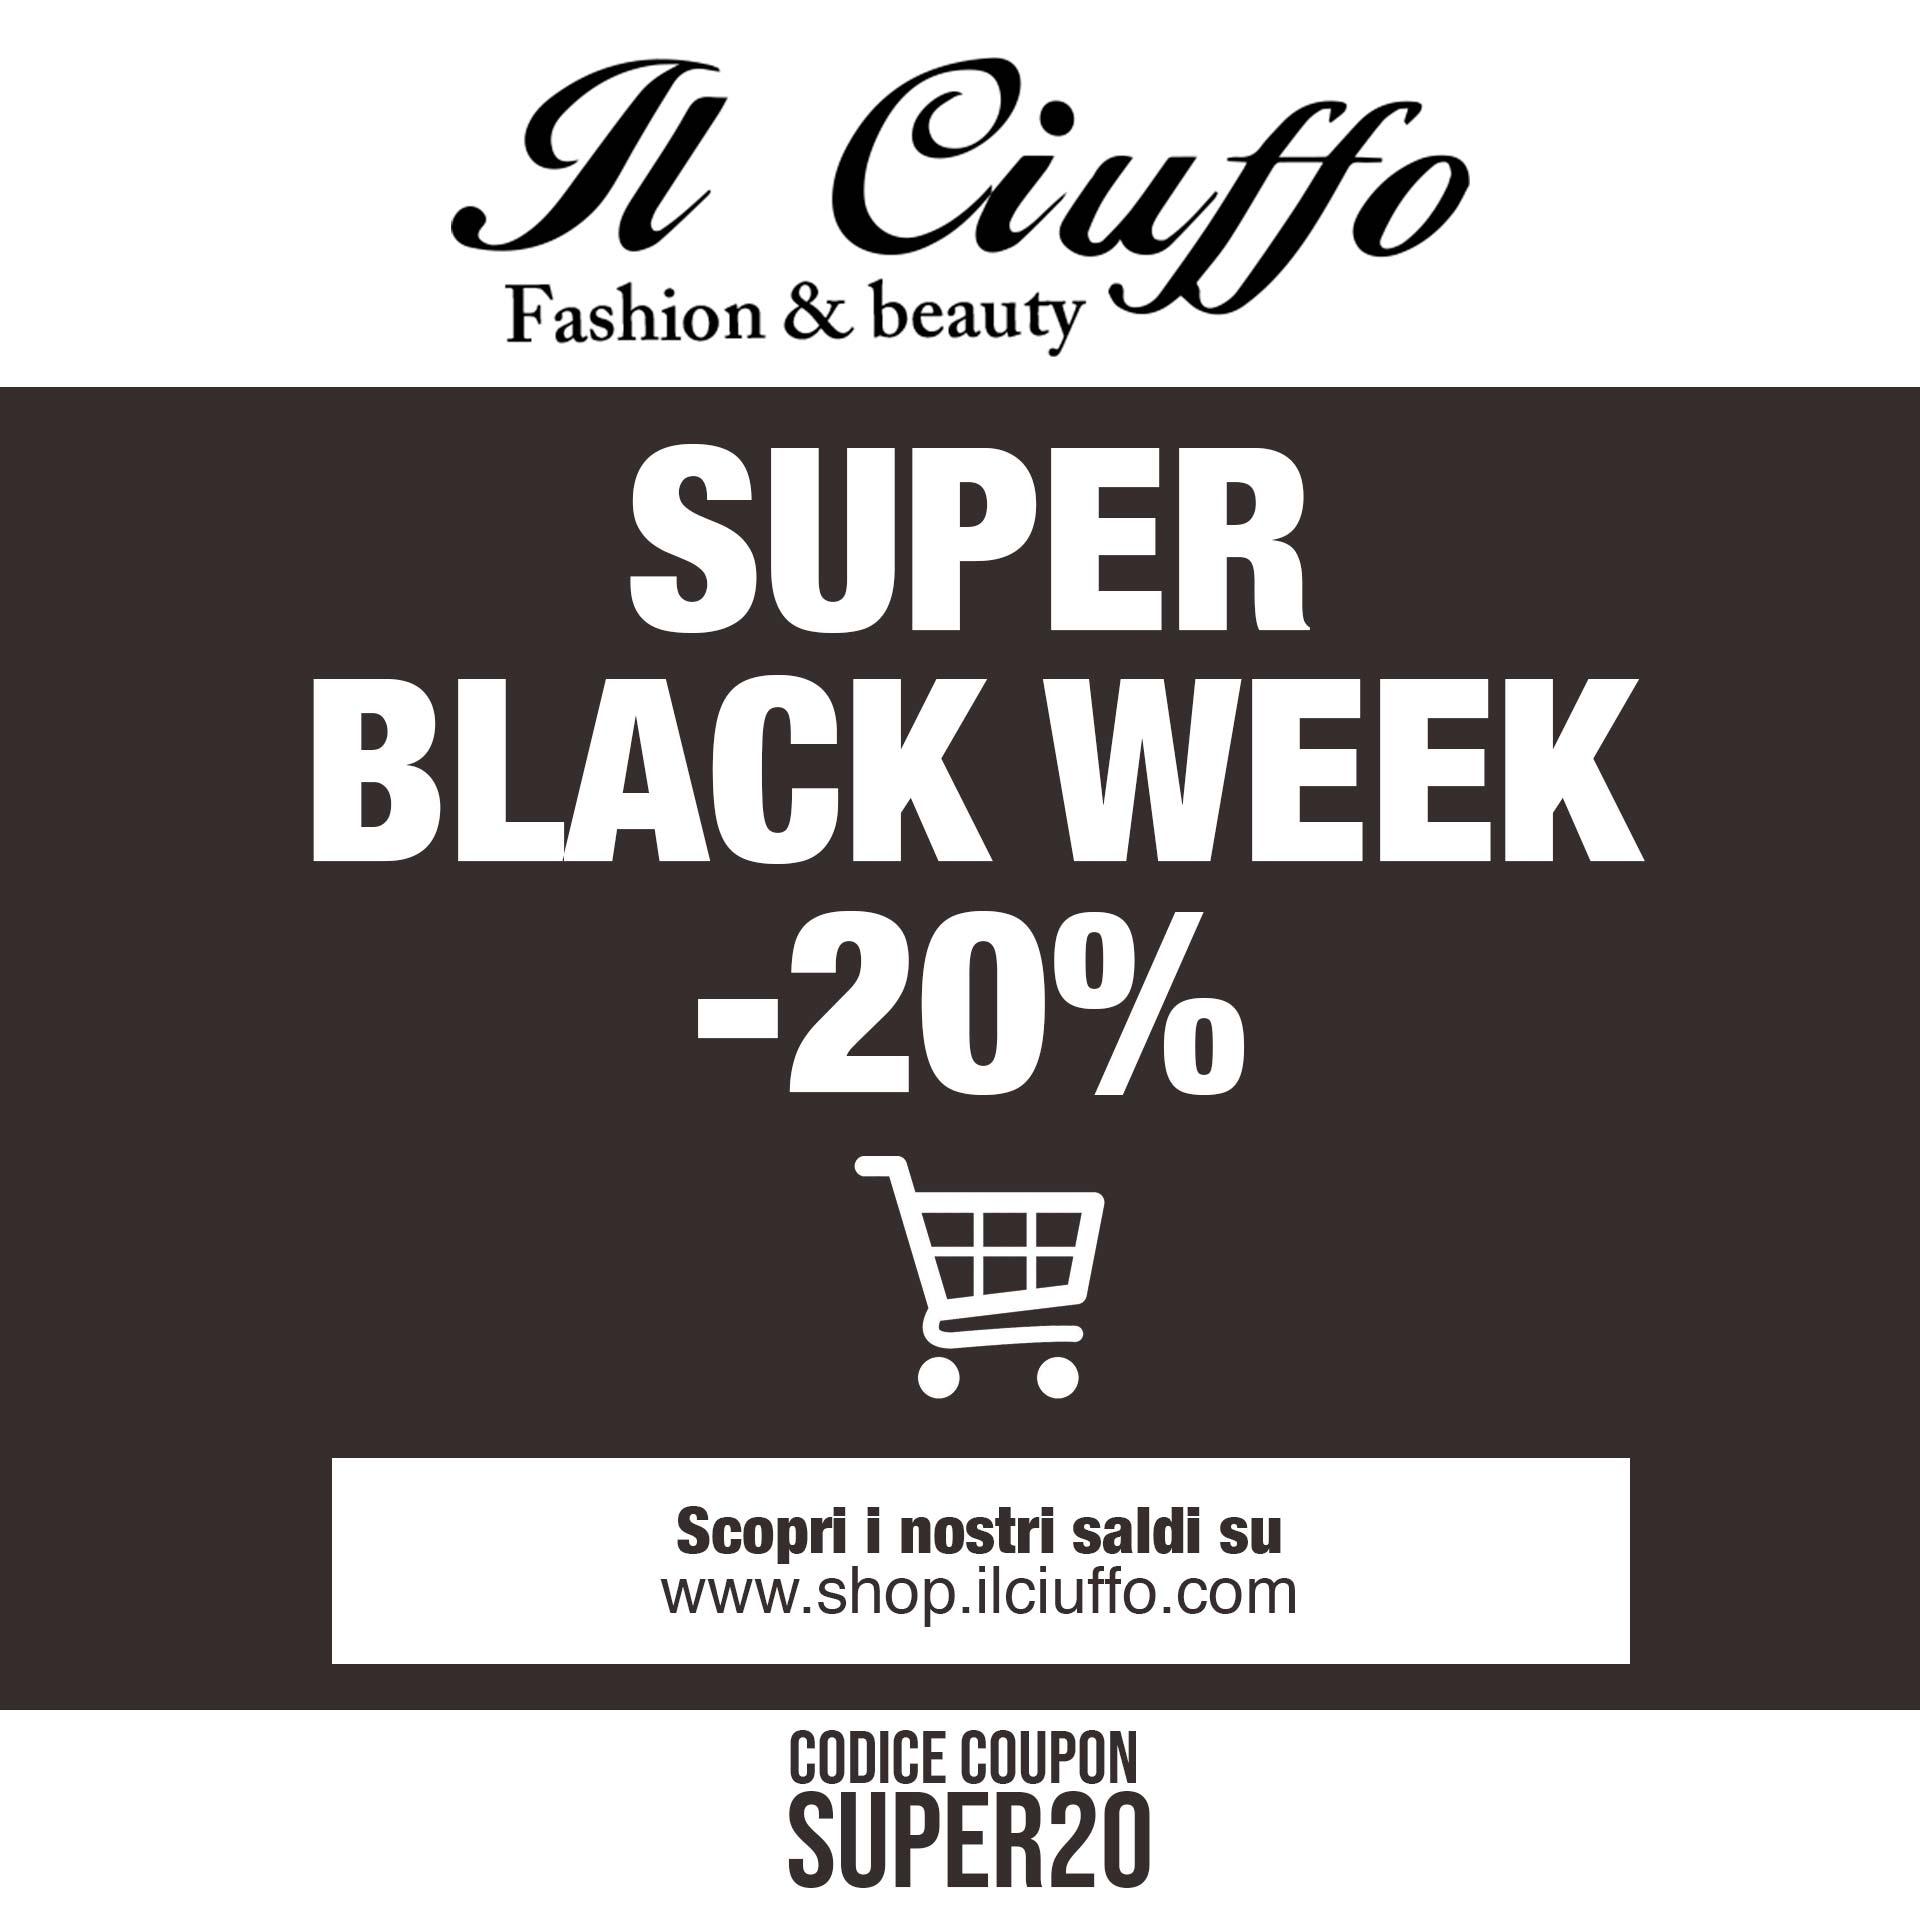 black week il ciuffo vercelli black friday